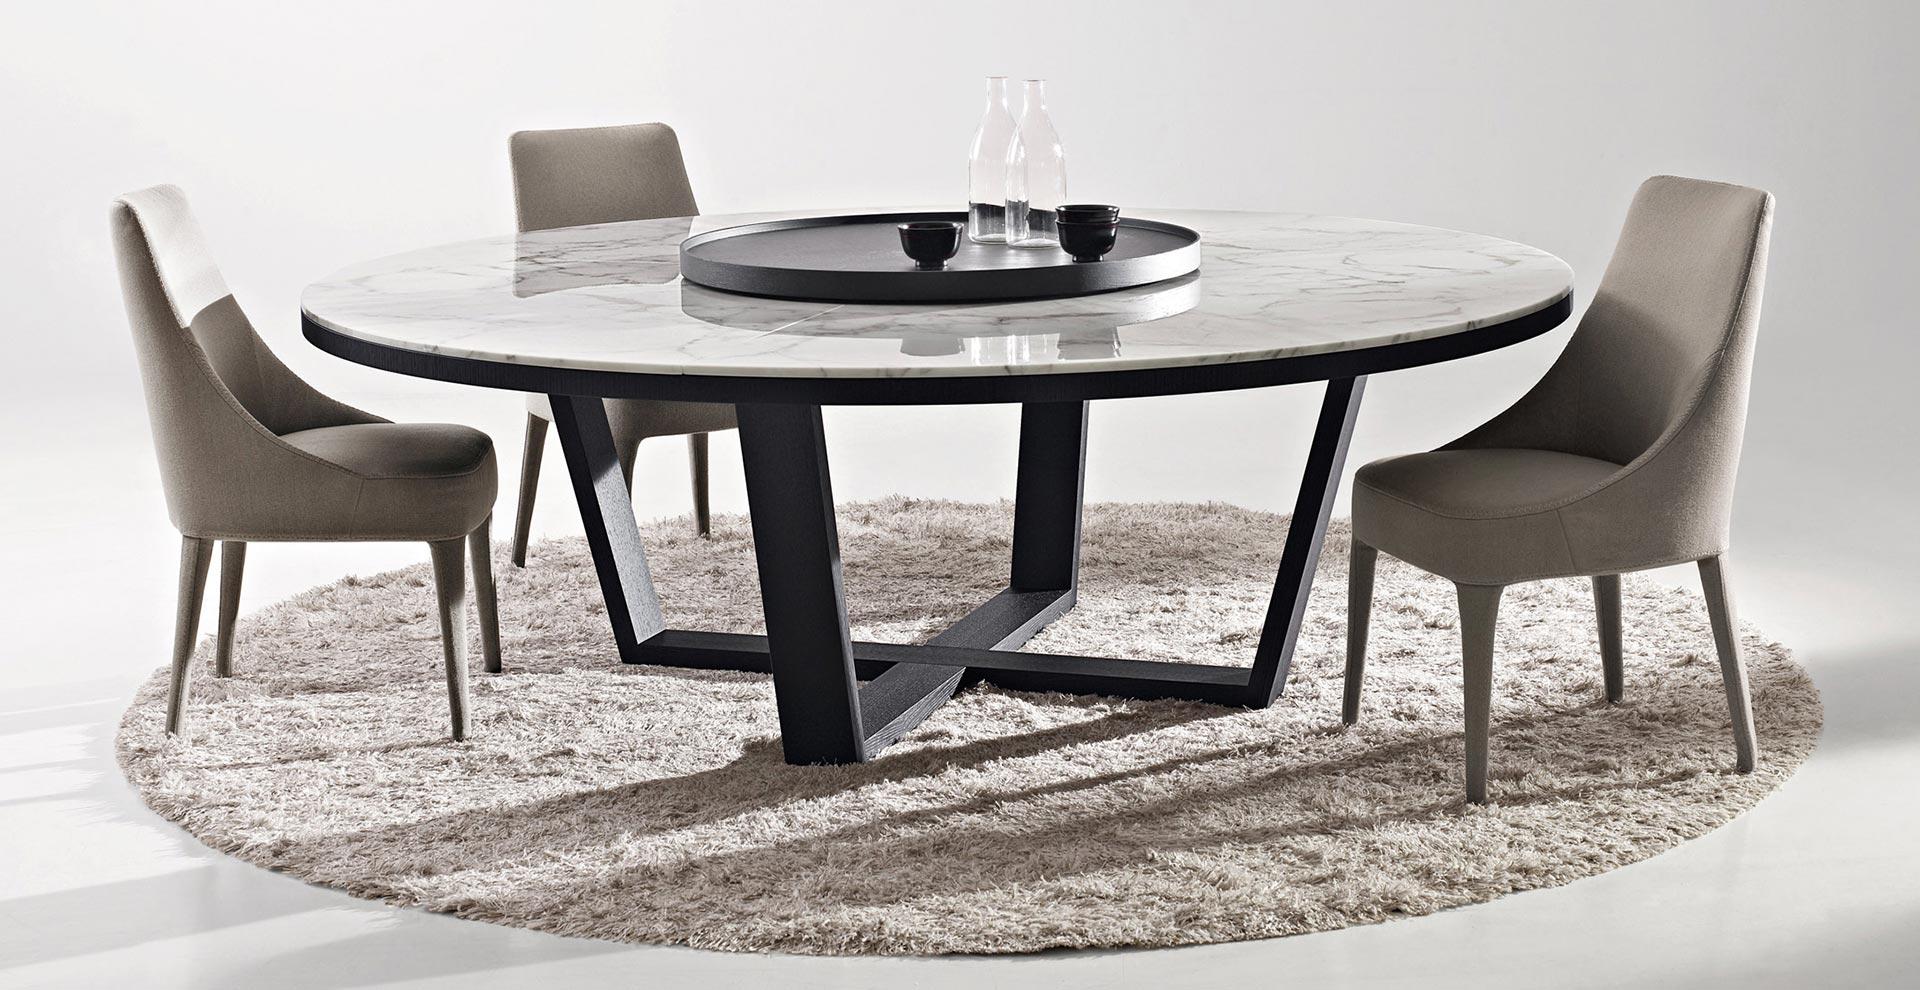 Table xilos maxalto tavolo xilos maxalto xilos maxalto for Php table design